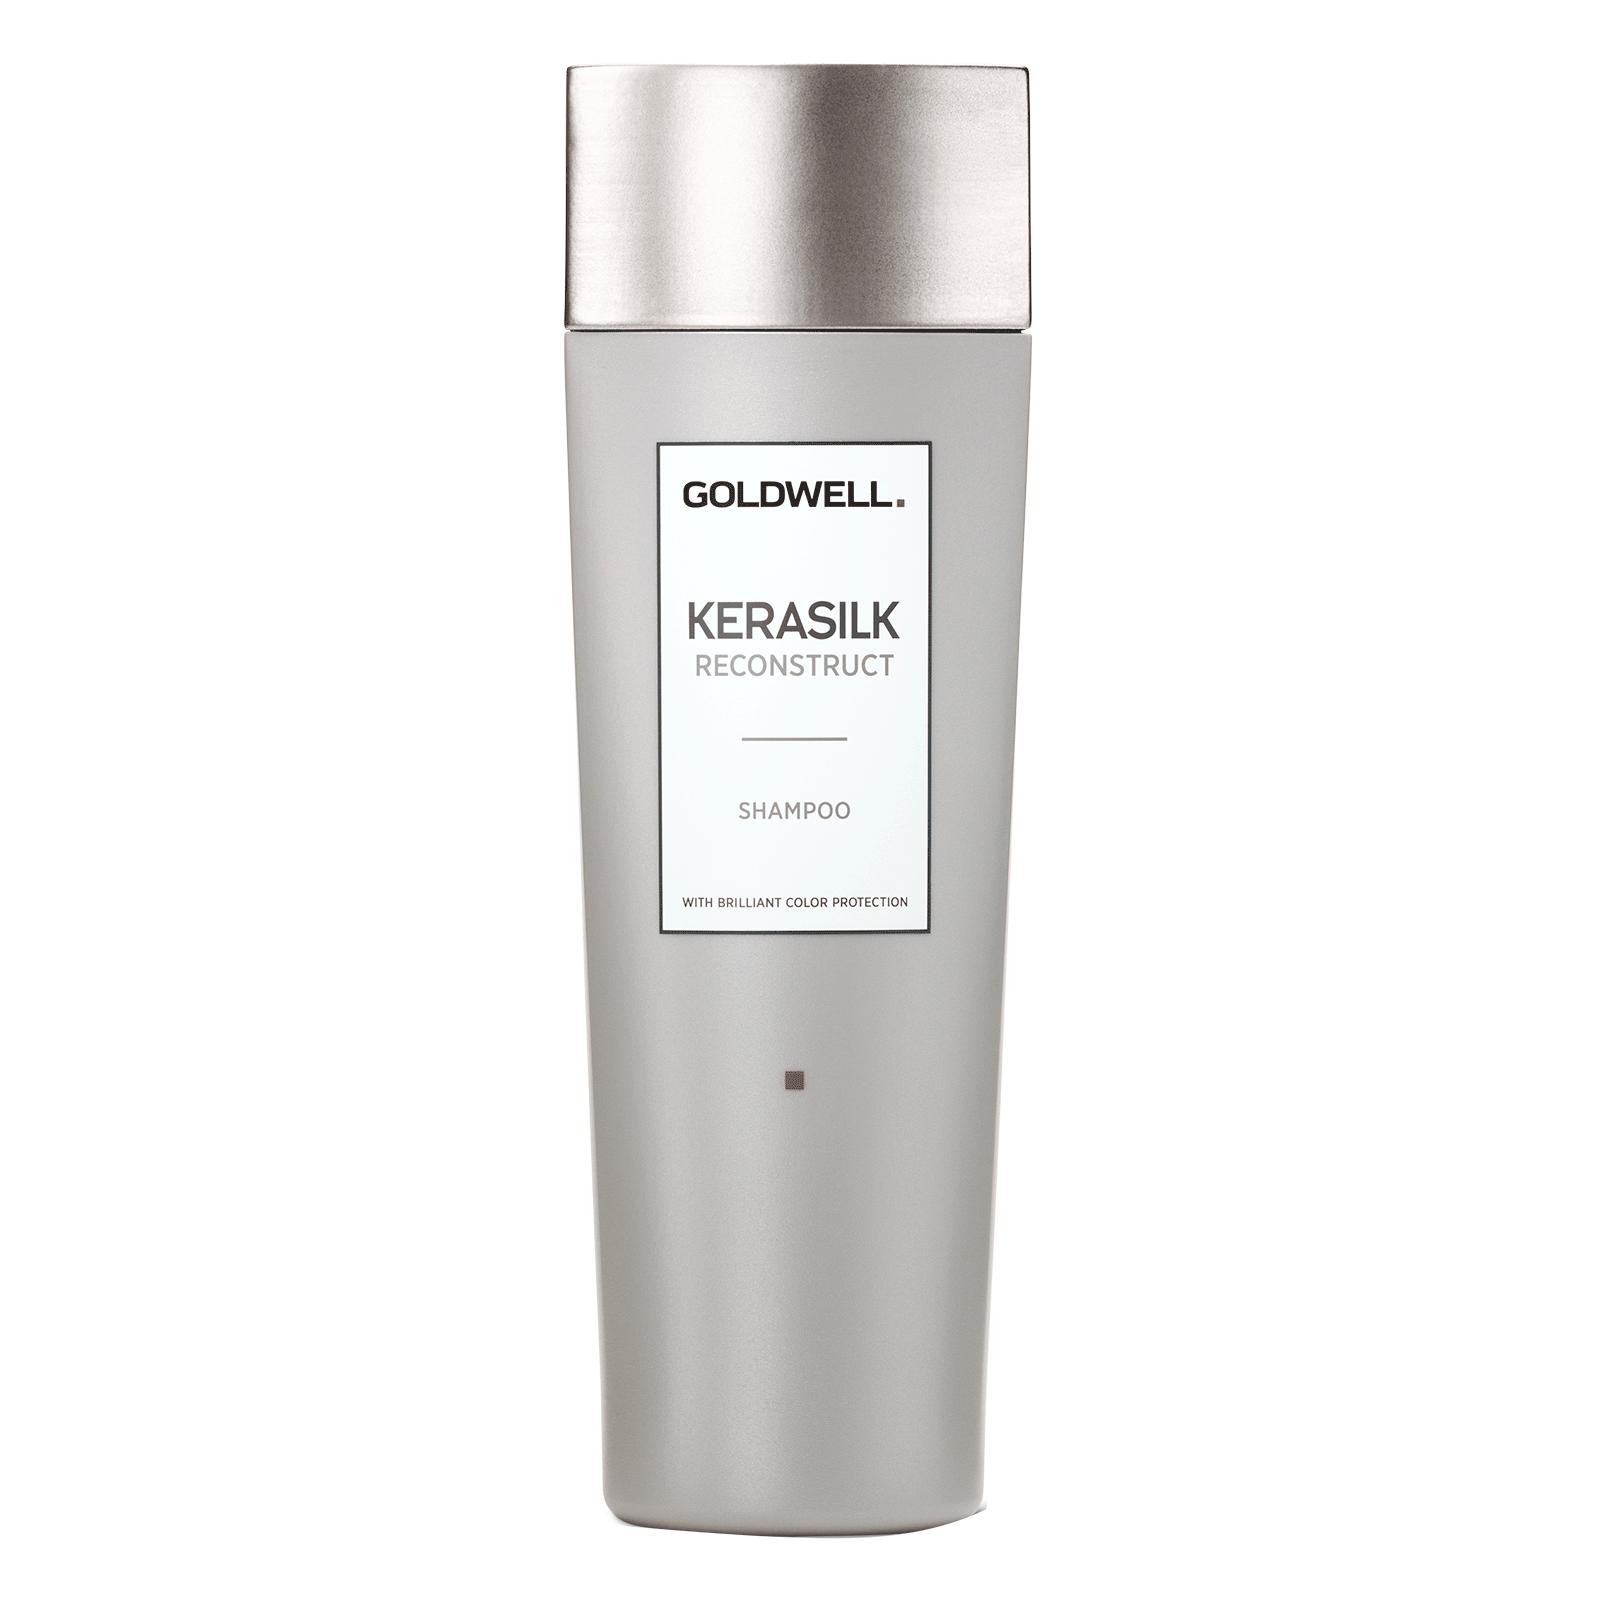 Goldwell USA Kerasilk - Reconstruct Shampoo 8.4oz